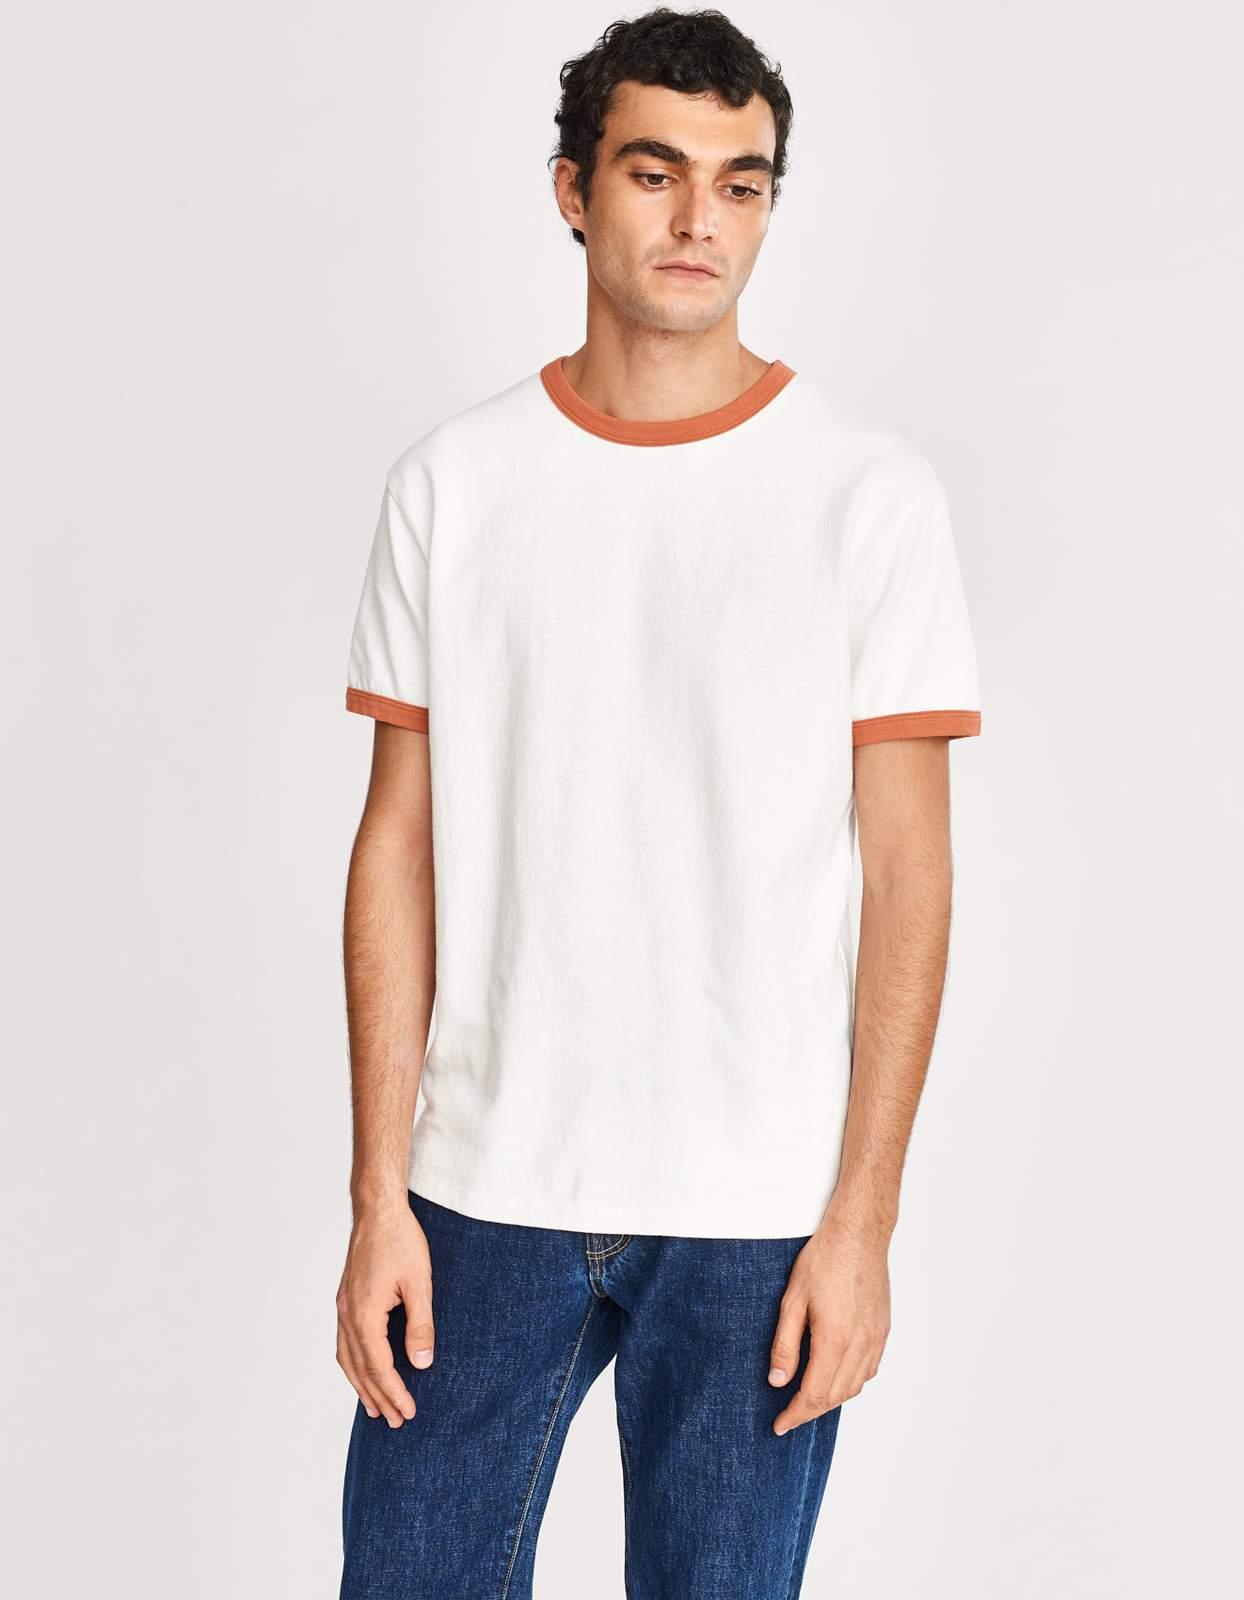 BLR-tshirt-flin-t1284-snow_33_1600x1600.jpg